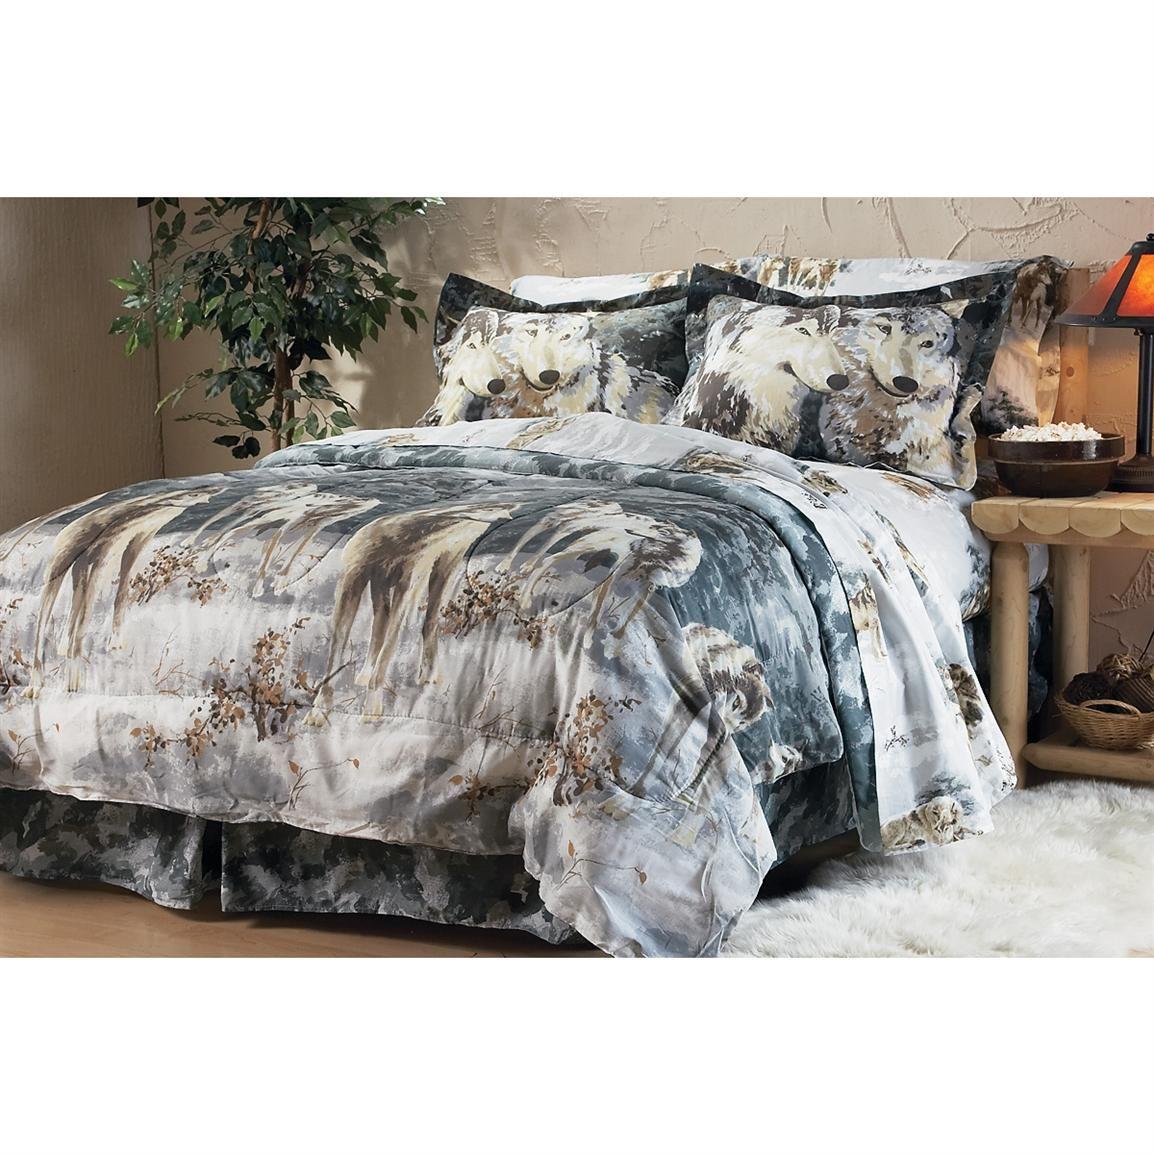 wolf bedding set  google search  room stuff  pinterest  bed  - wolf bedding set  google search